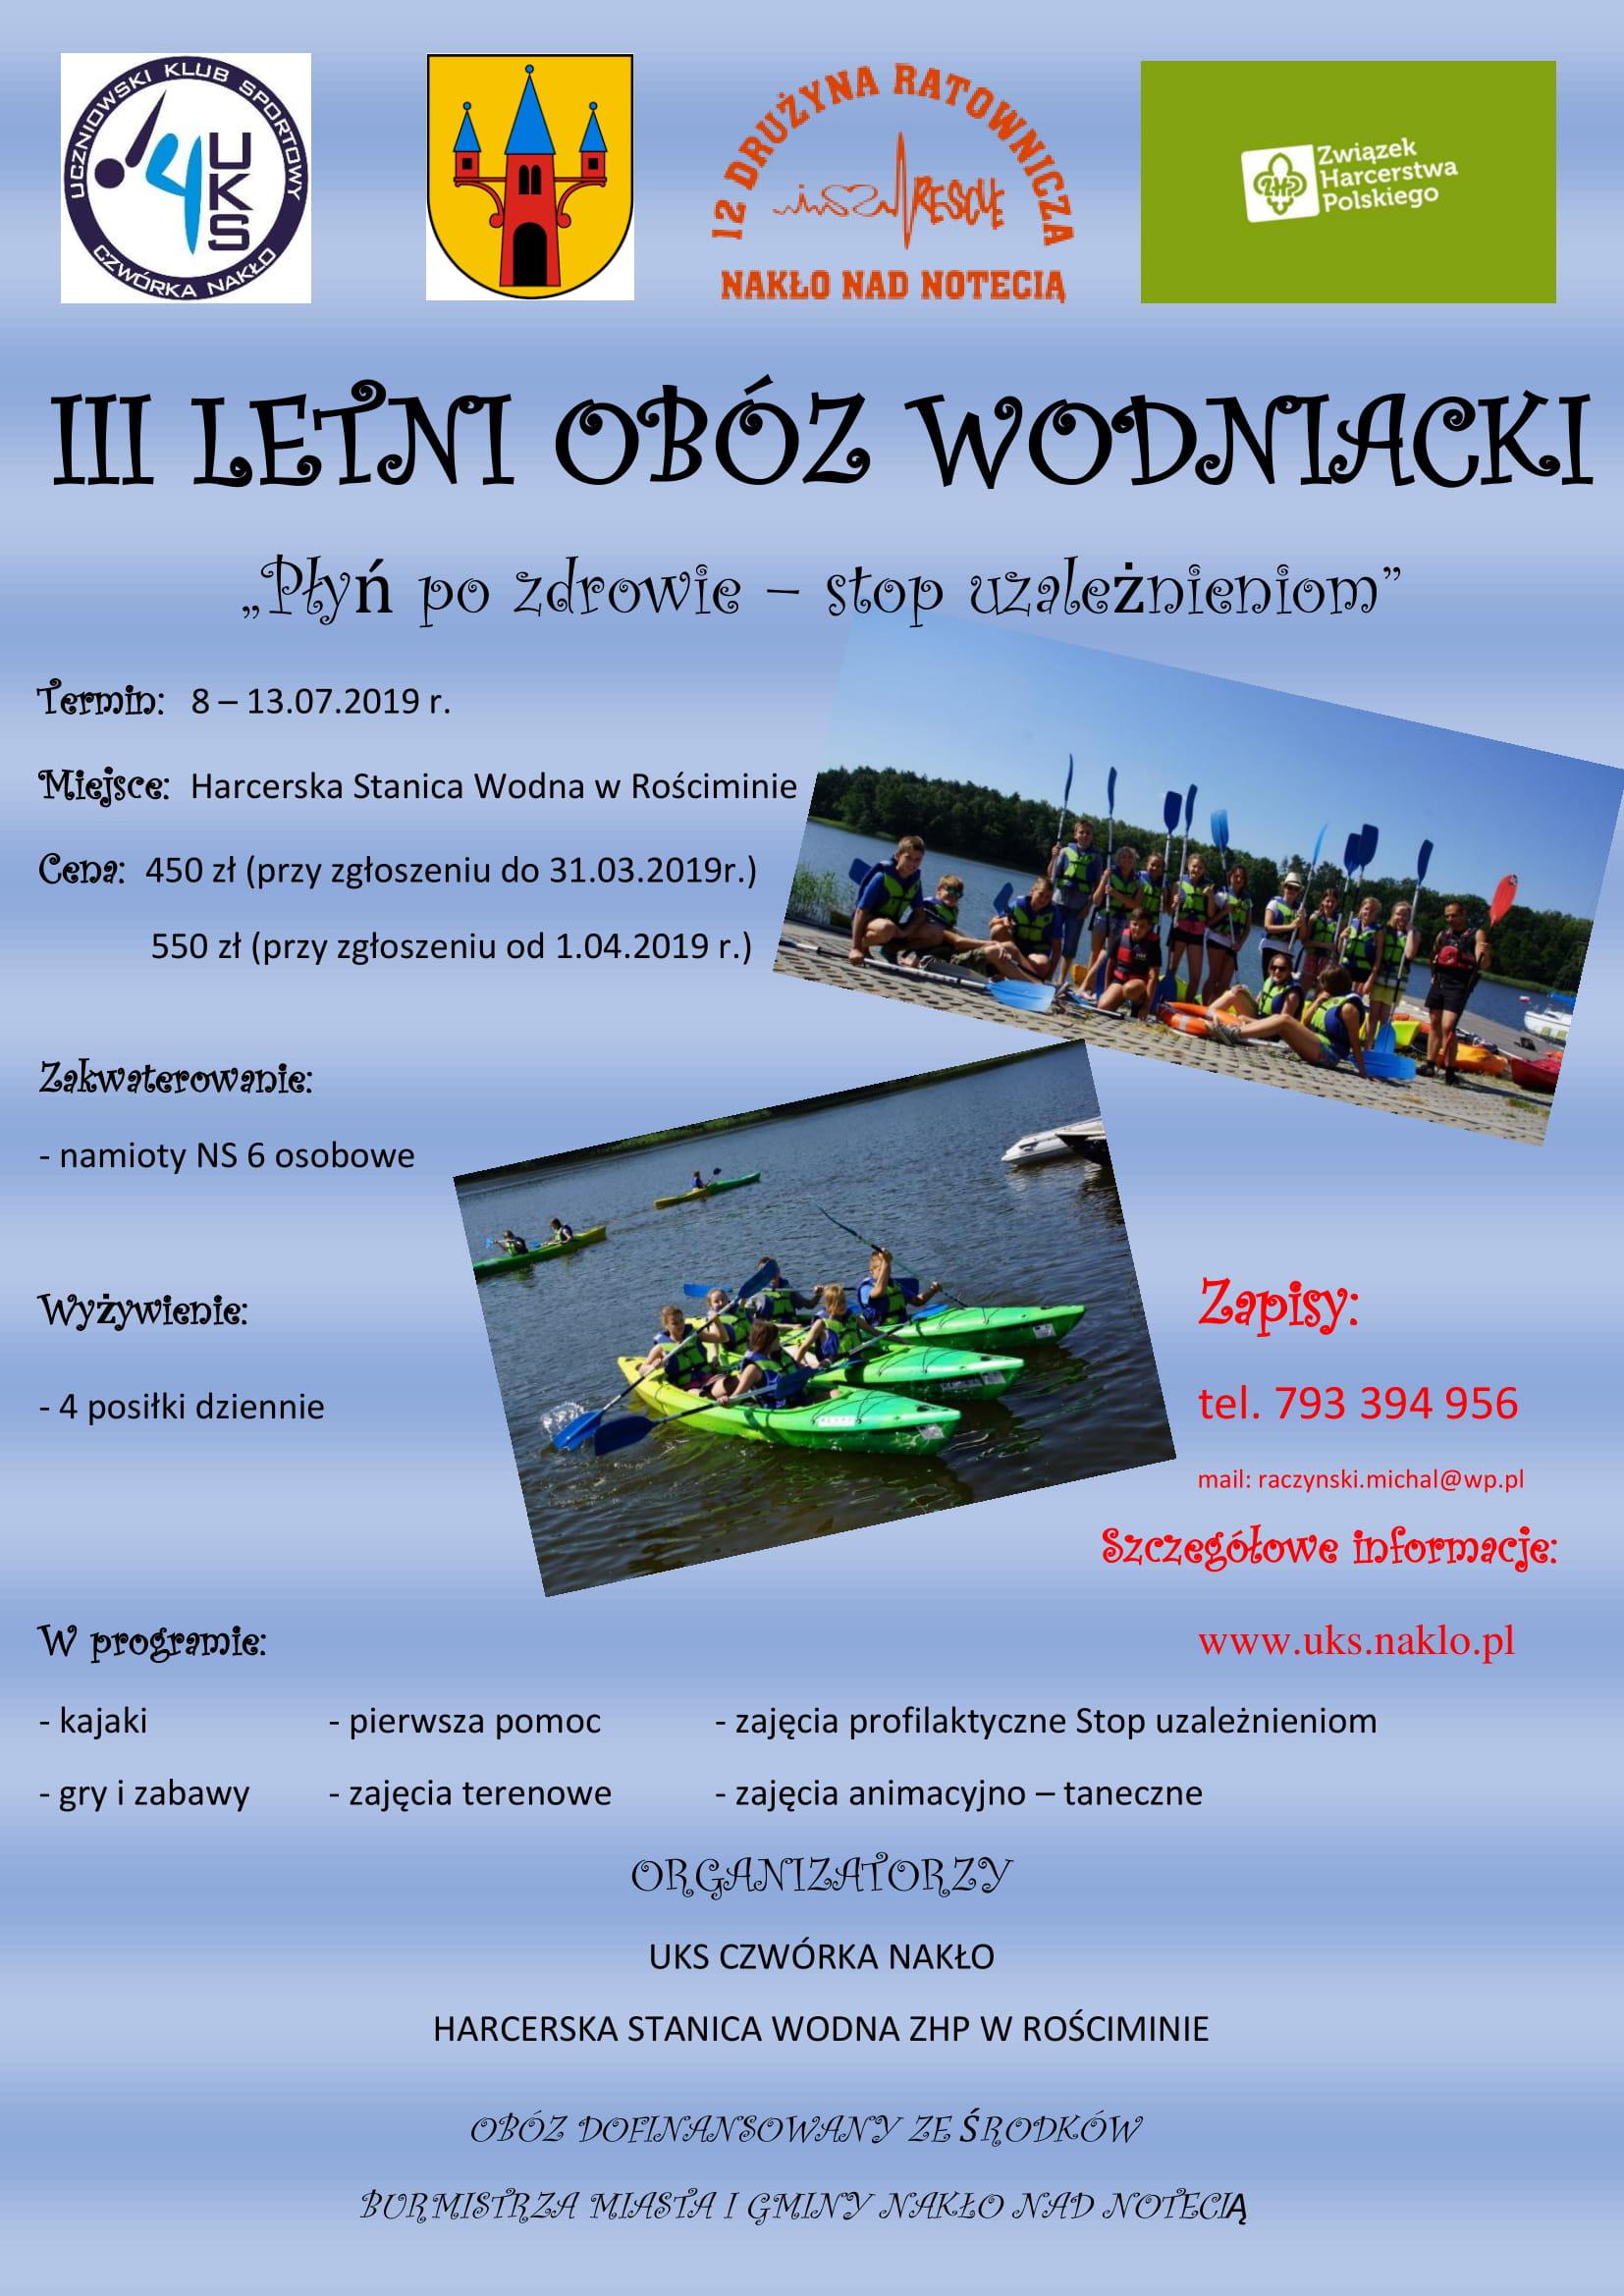 iii-letni-oboz-wodniacki-uks-plakat-1